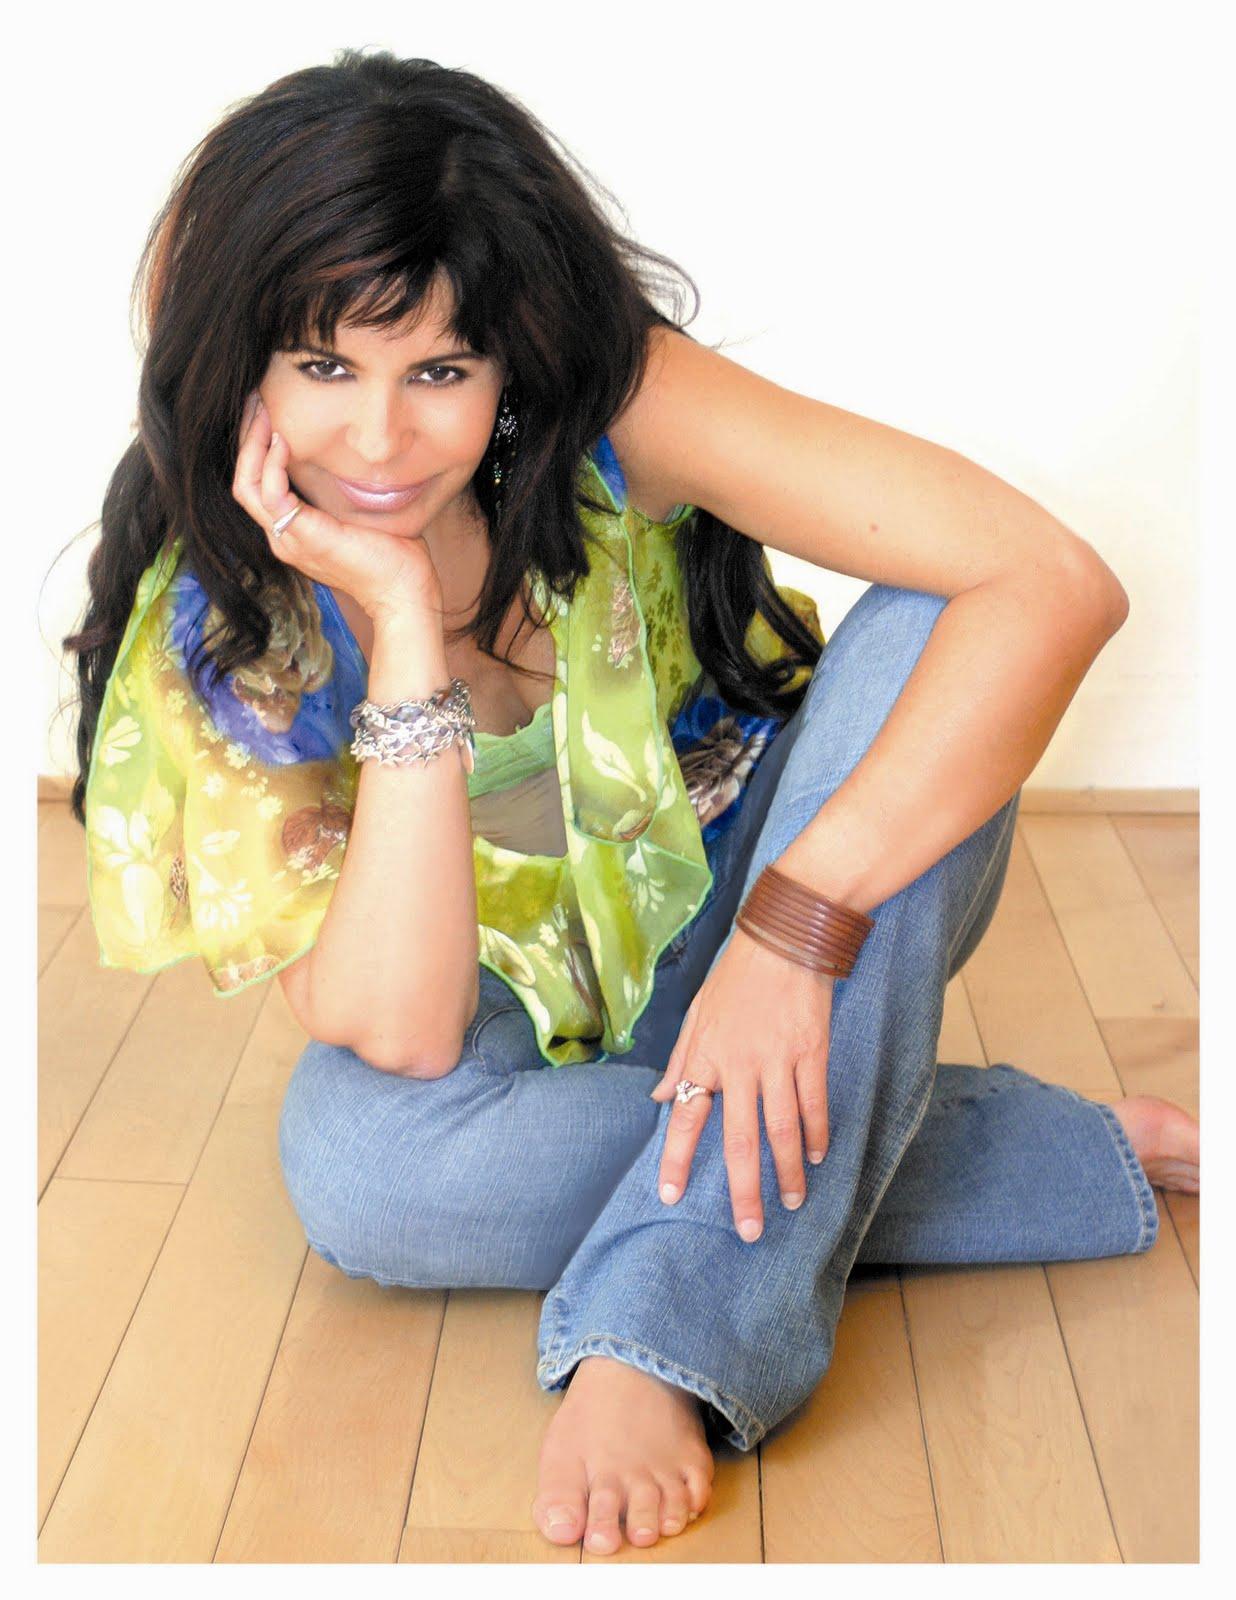 http://1.bp.blogspot.com/-tAHIXPvoRa8/TvFQoK7tSLI/AAAAAAAAG38/SyCRBc72Ko0/s1600/Maria%2BConchita1.JPG